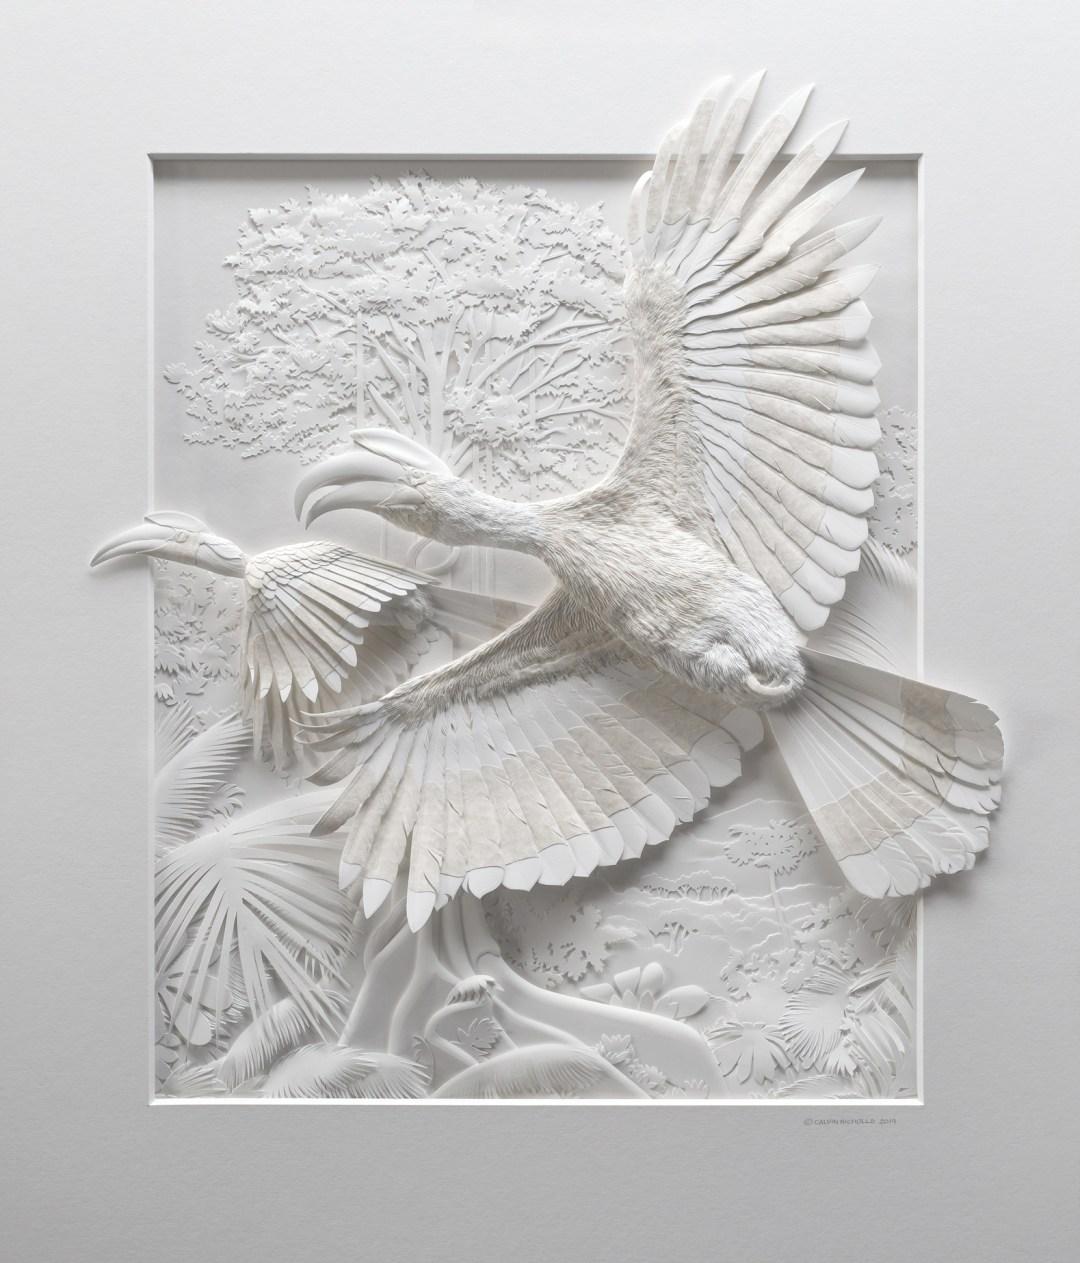 Intricate Paper Animals Spring from Textured Sculptures by Artist Calvin Nicholls